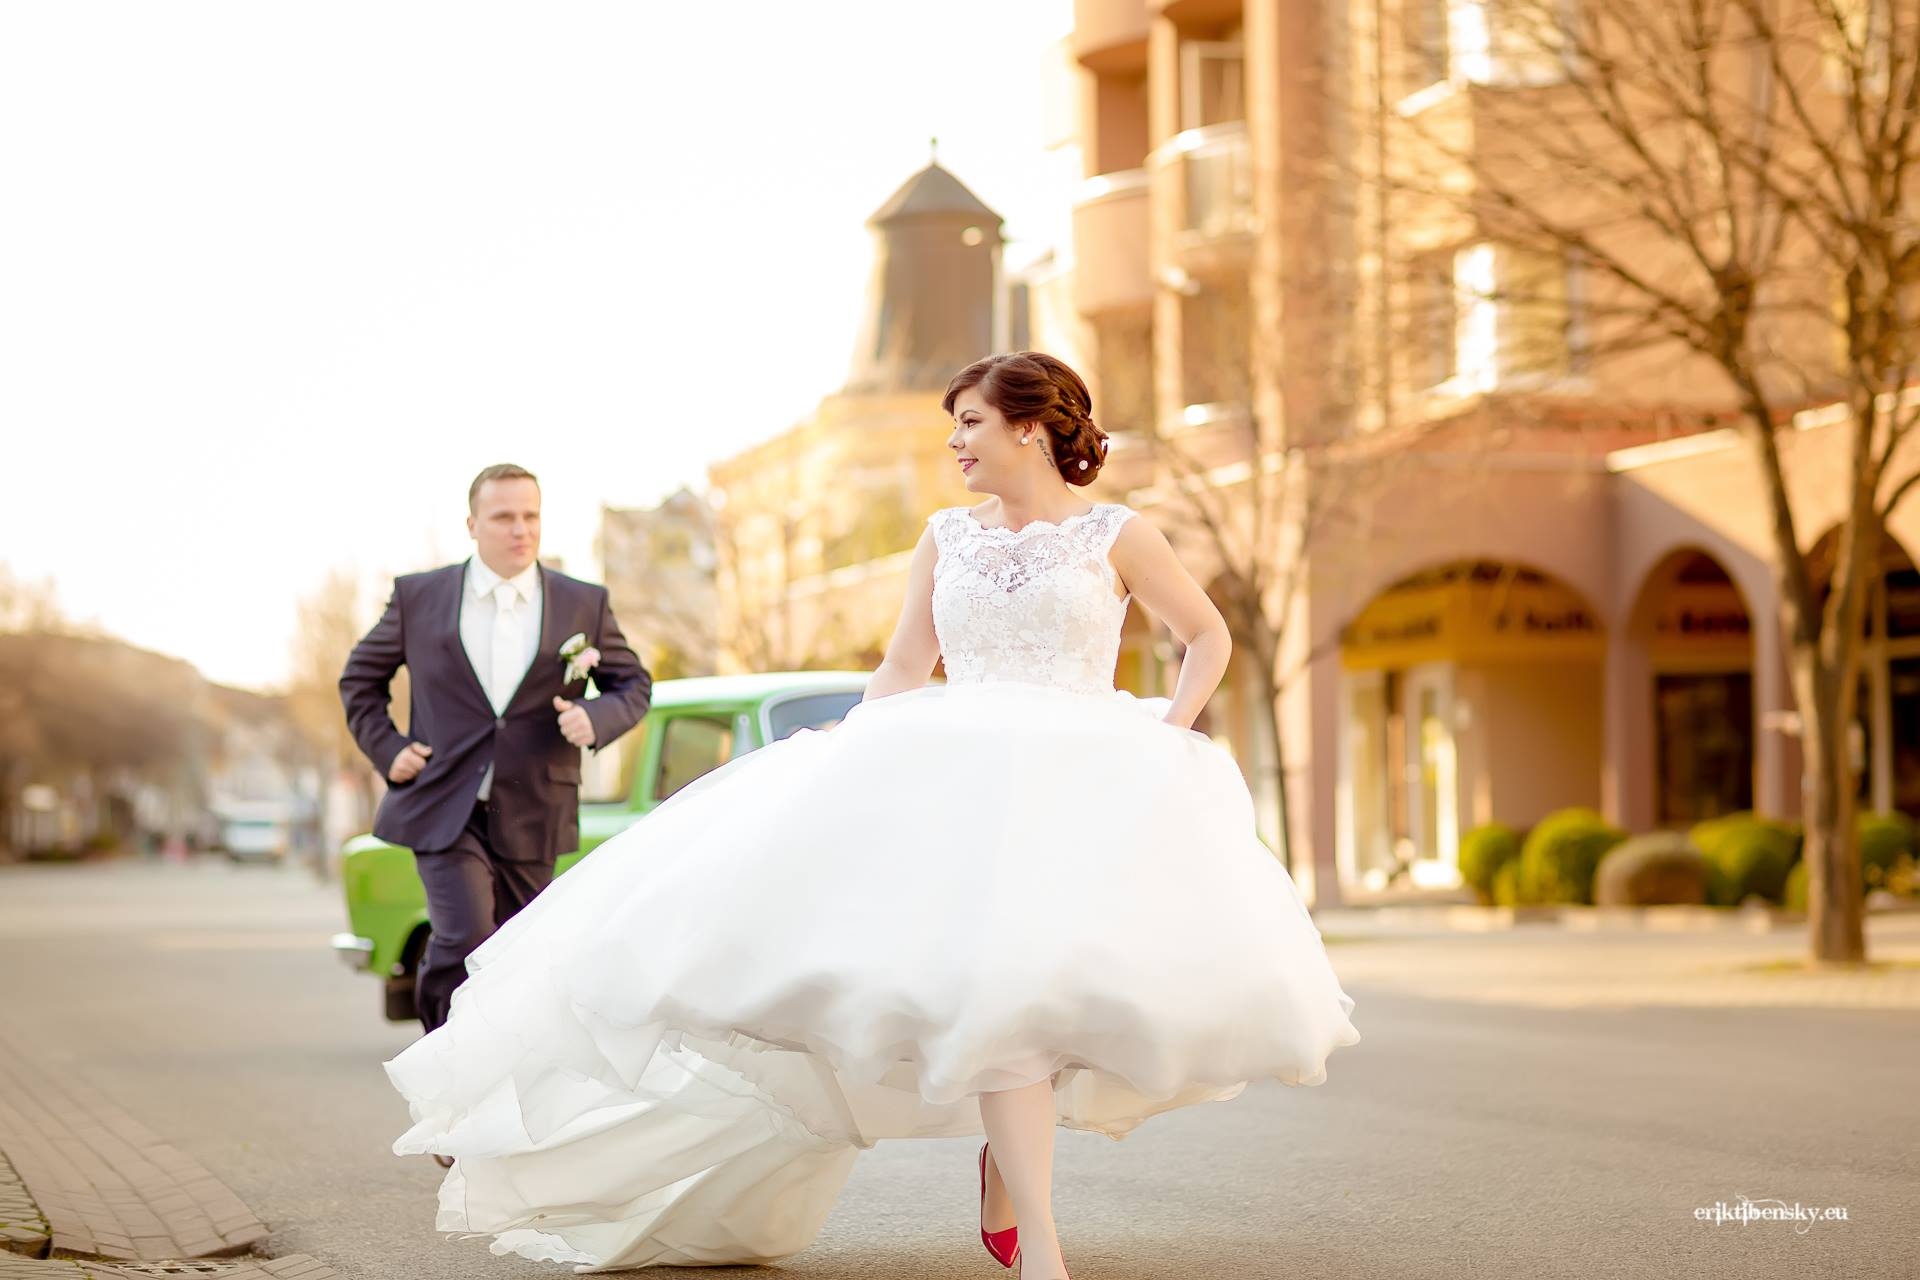 eriktibensky.eu-svadobny-fotograf-wedding-photographer-lea-stefan-1000